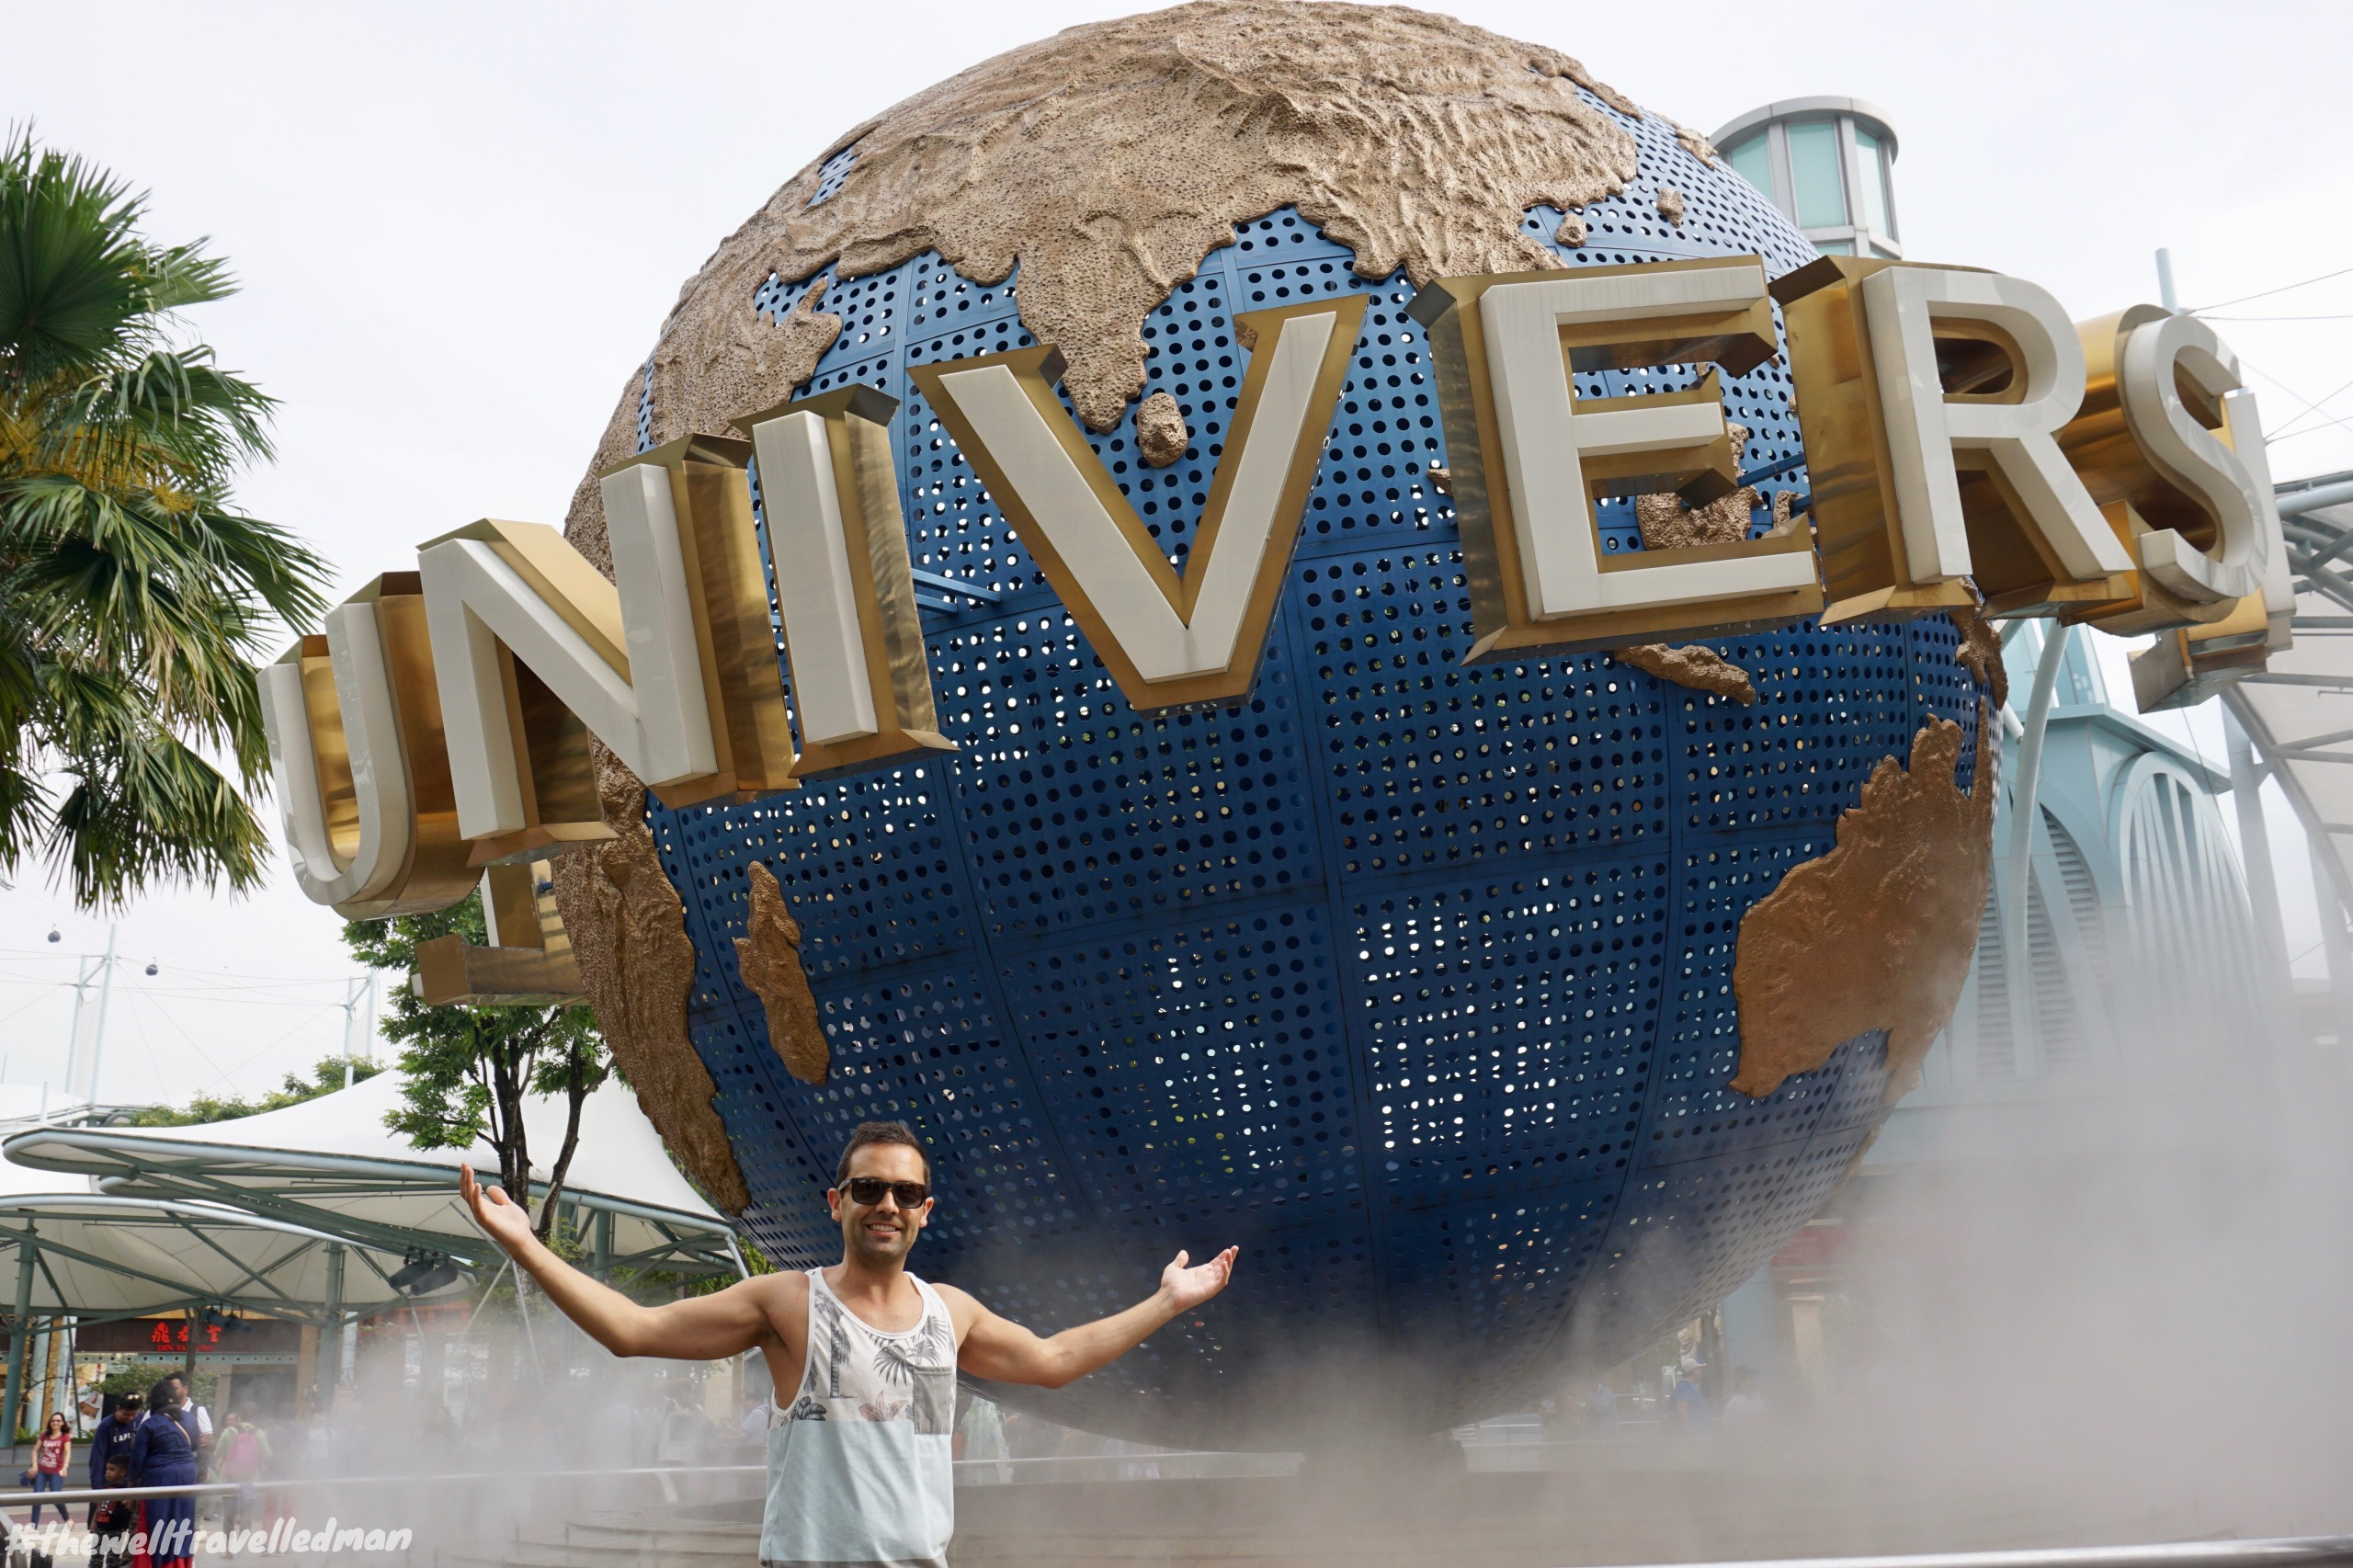 thewelltravelledman universal studios singapore